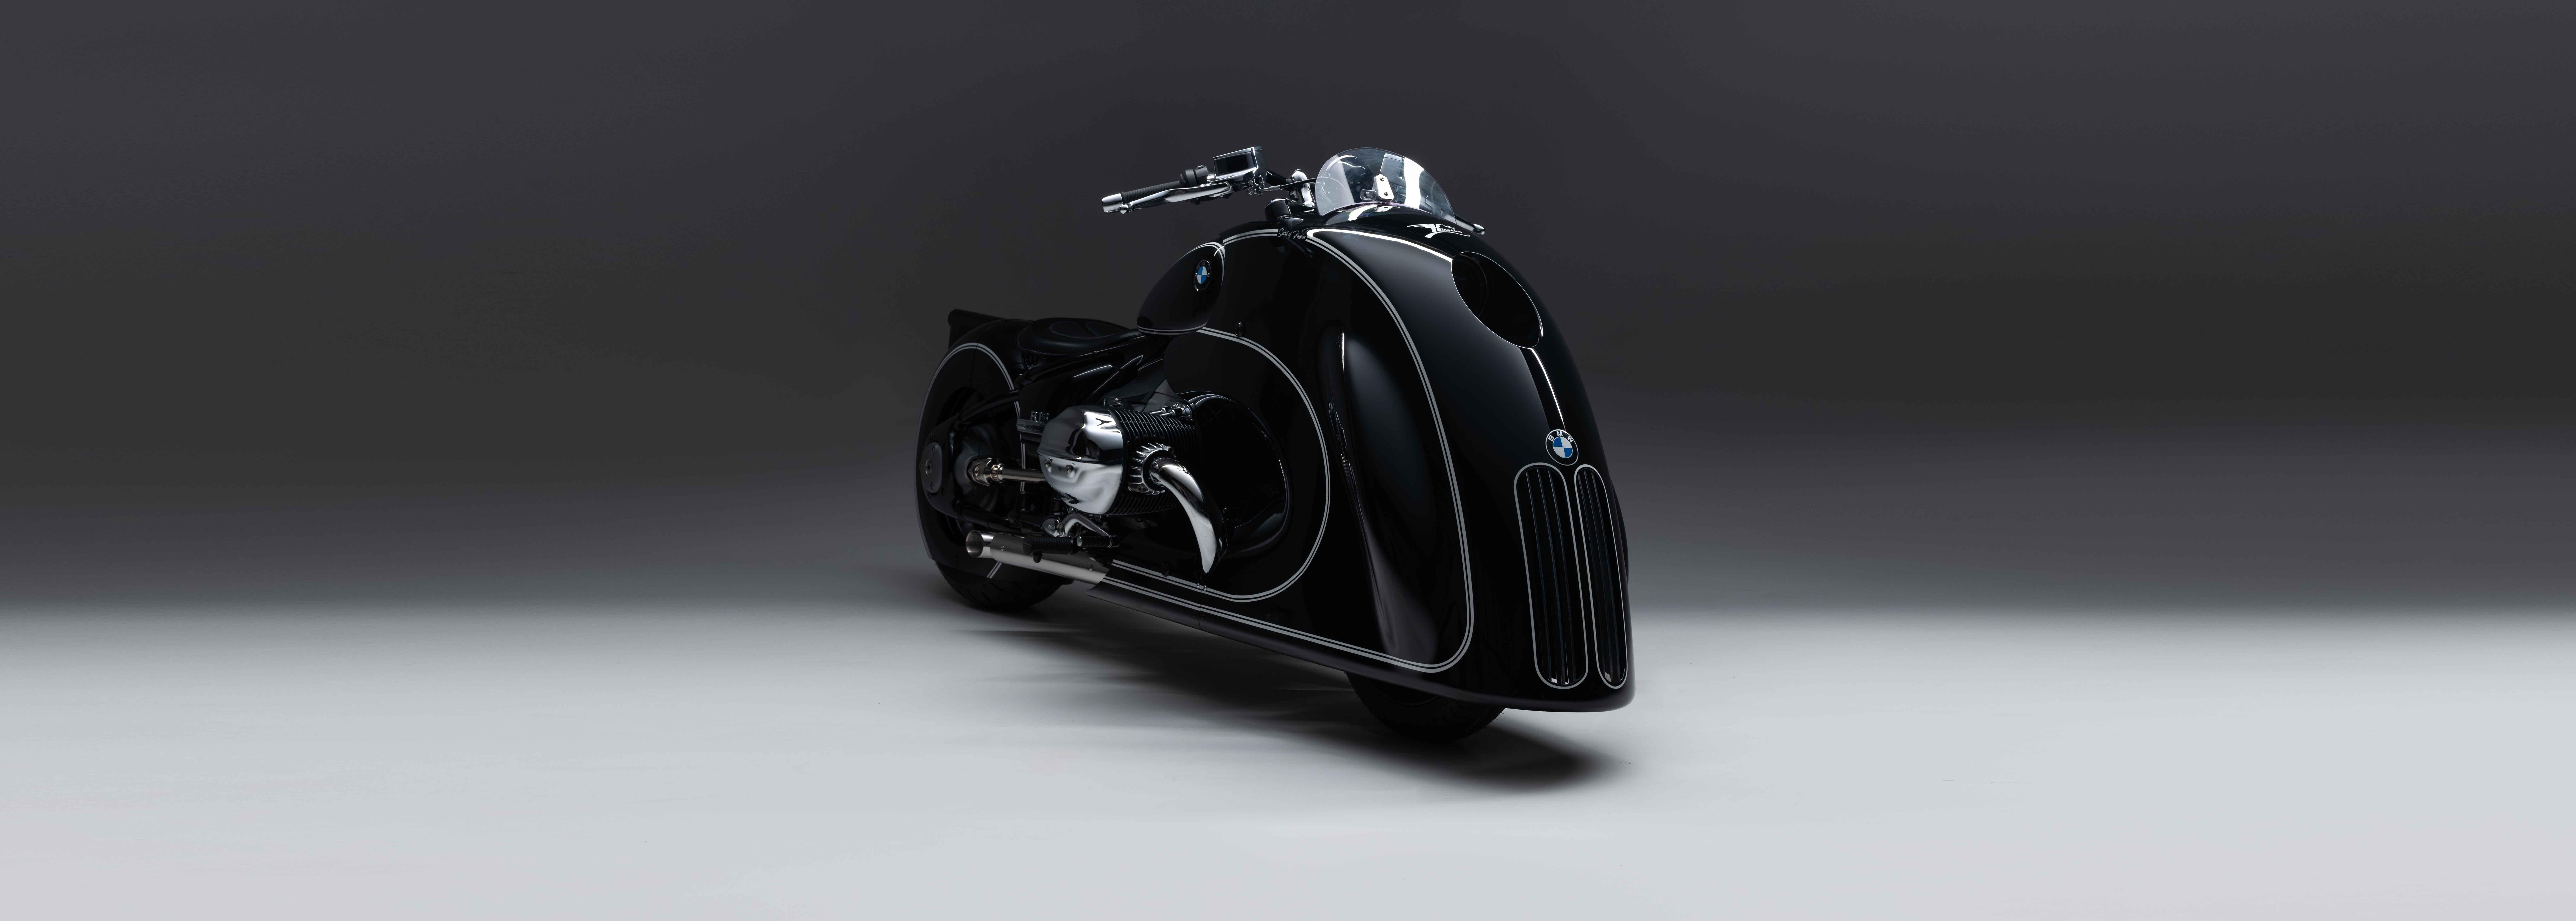 BMW Motorrad showcases custom R18